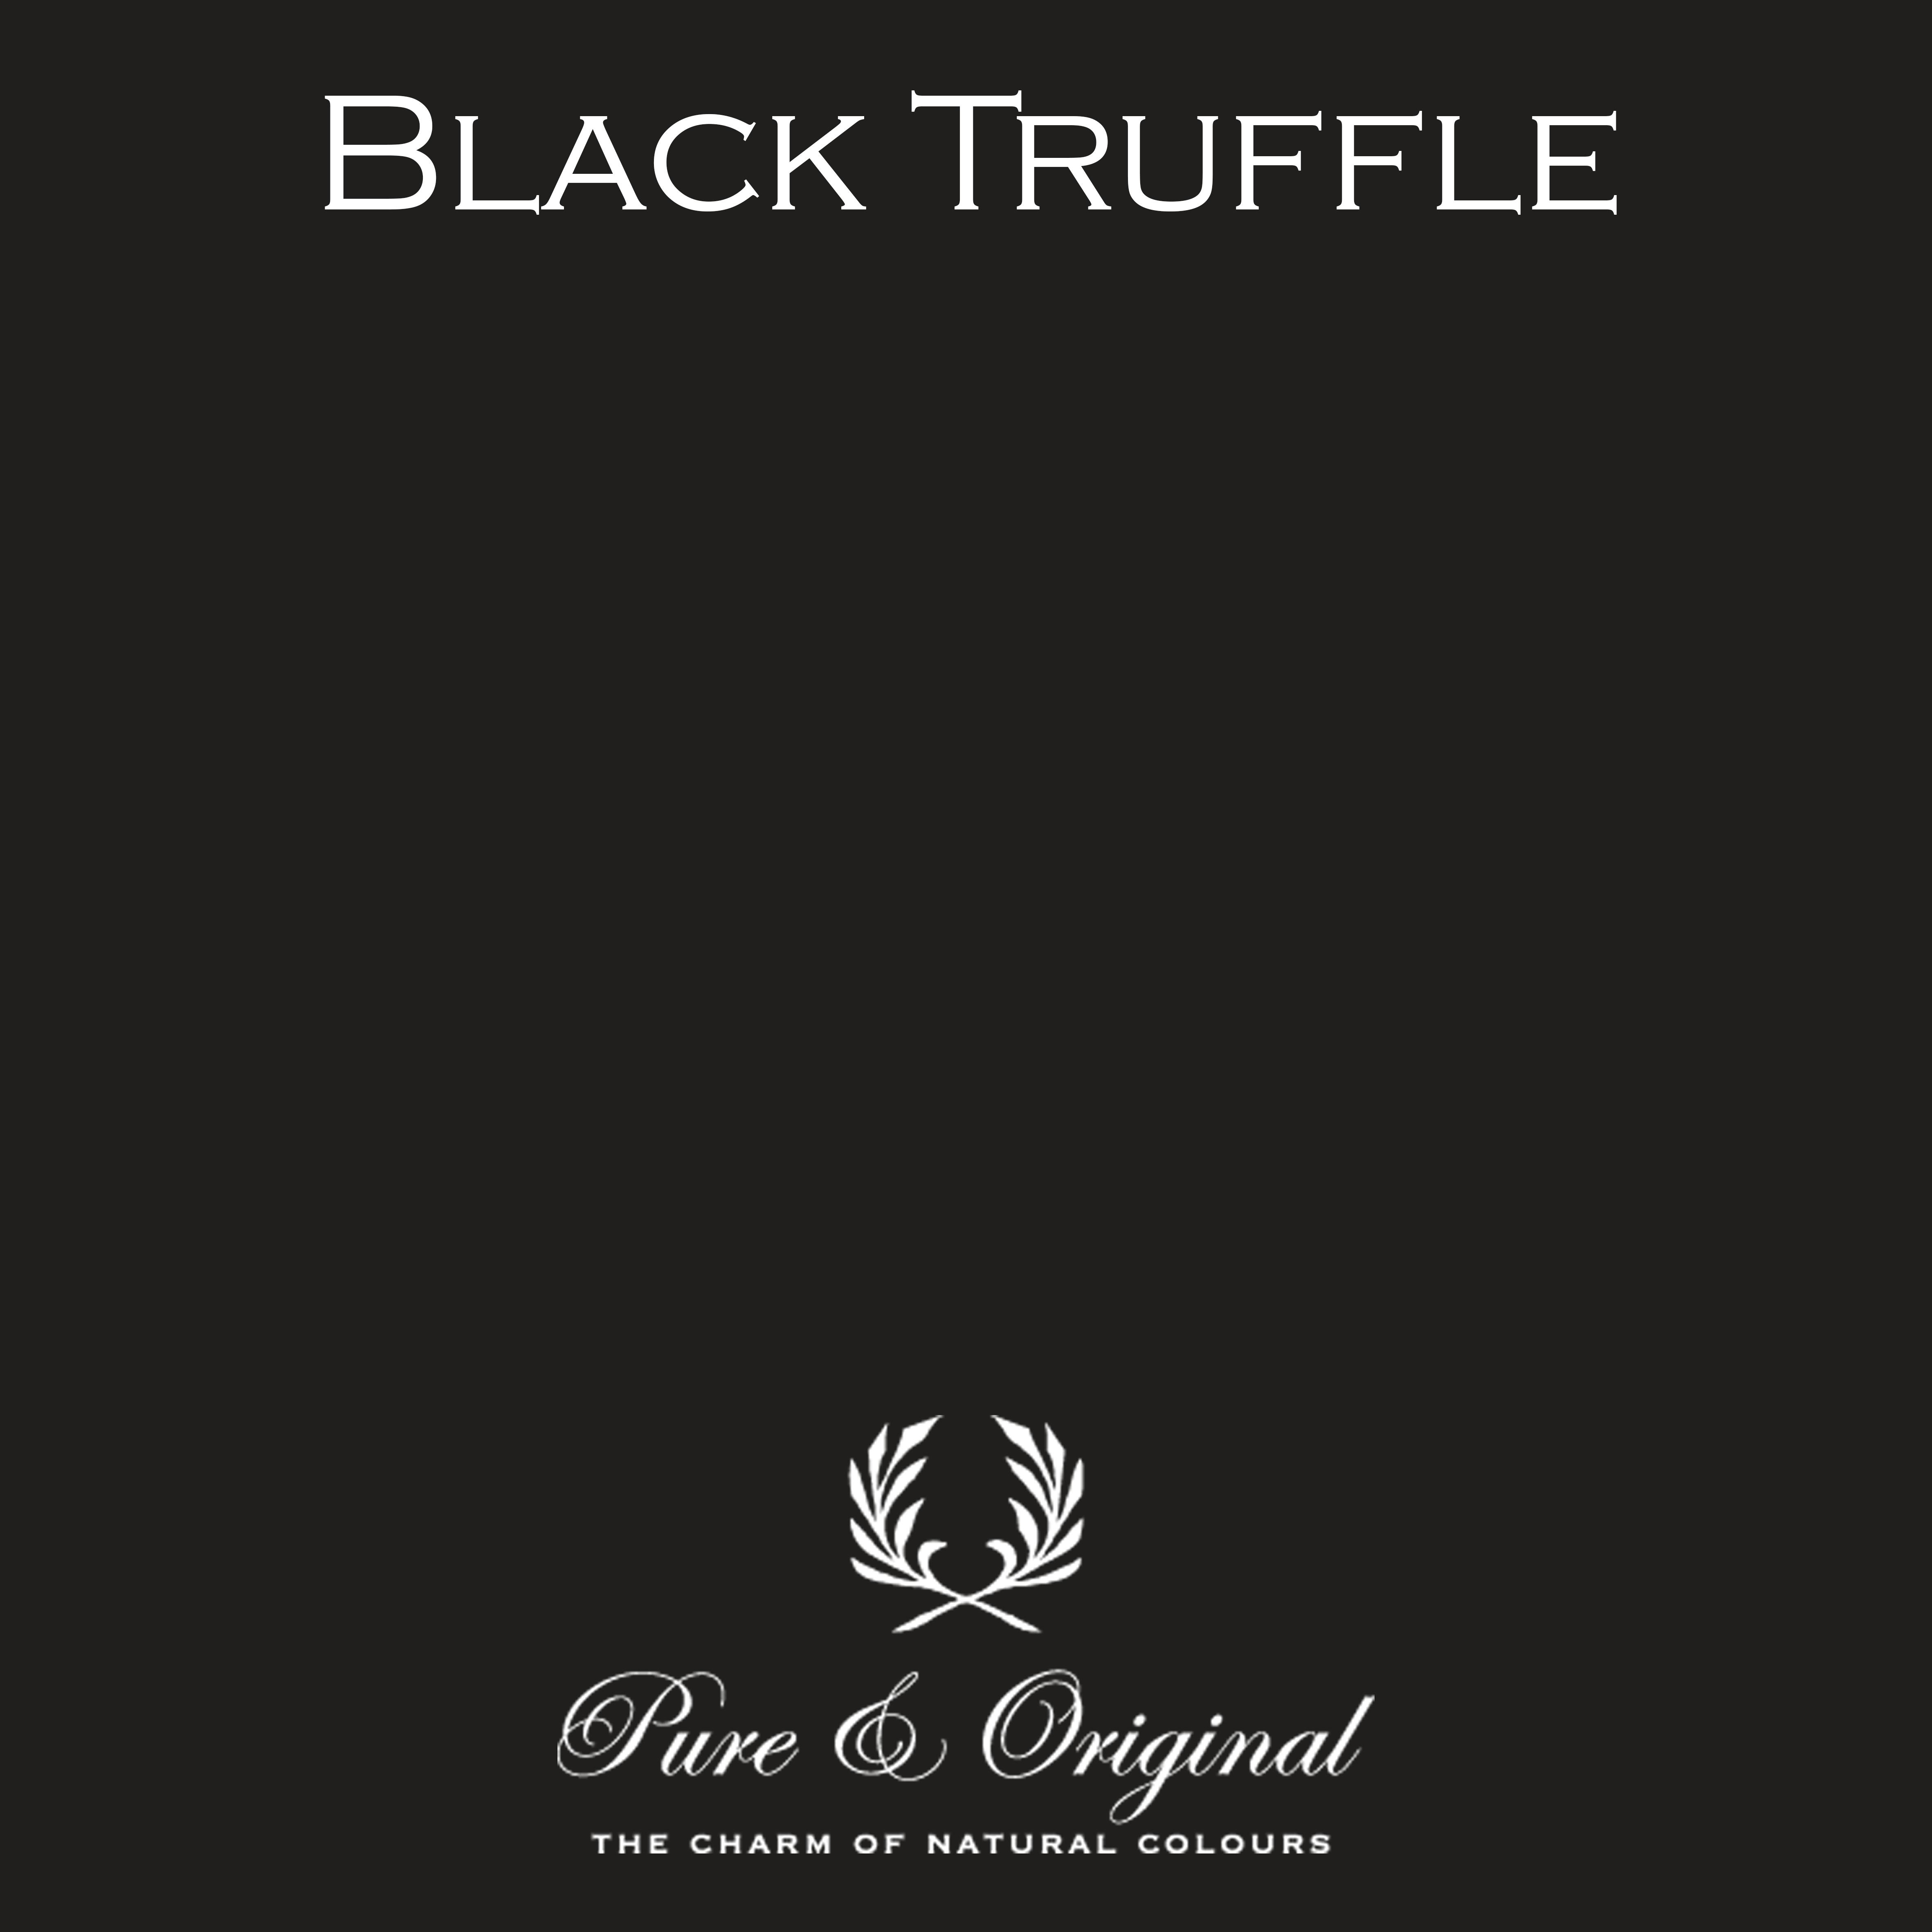 Kulör Black Truffle, Classico kritfärg